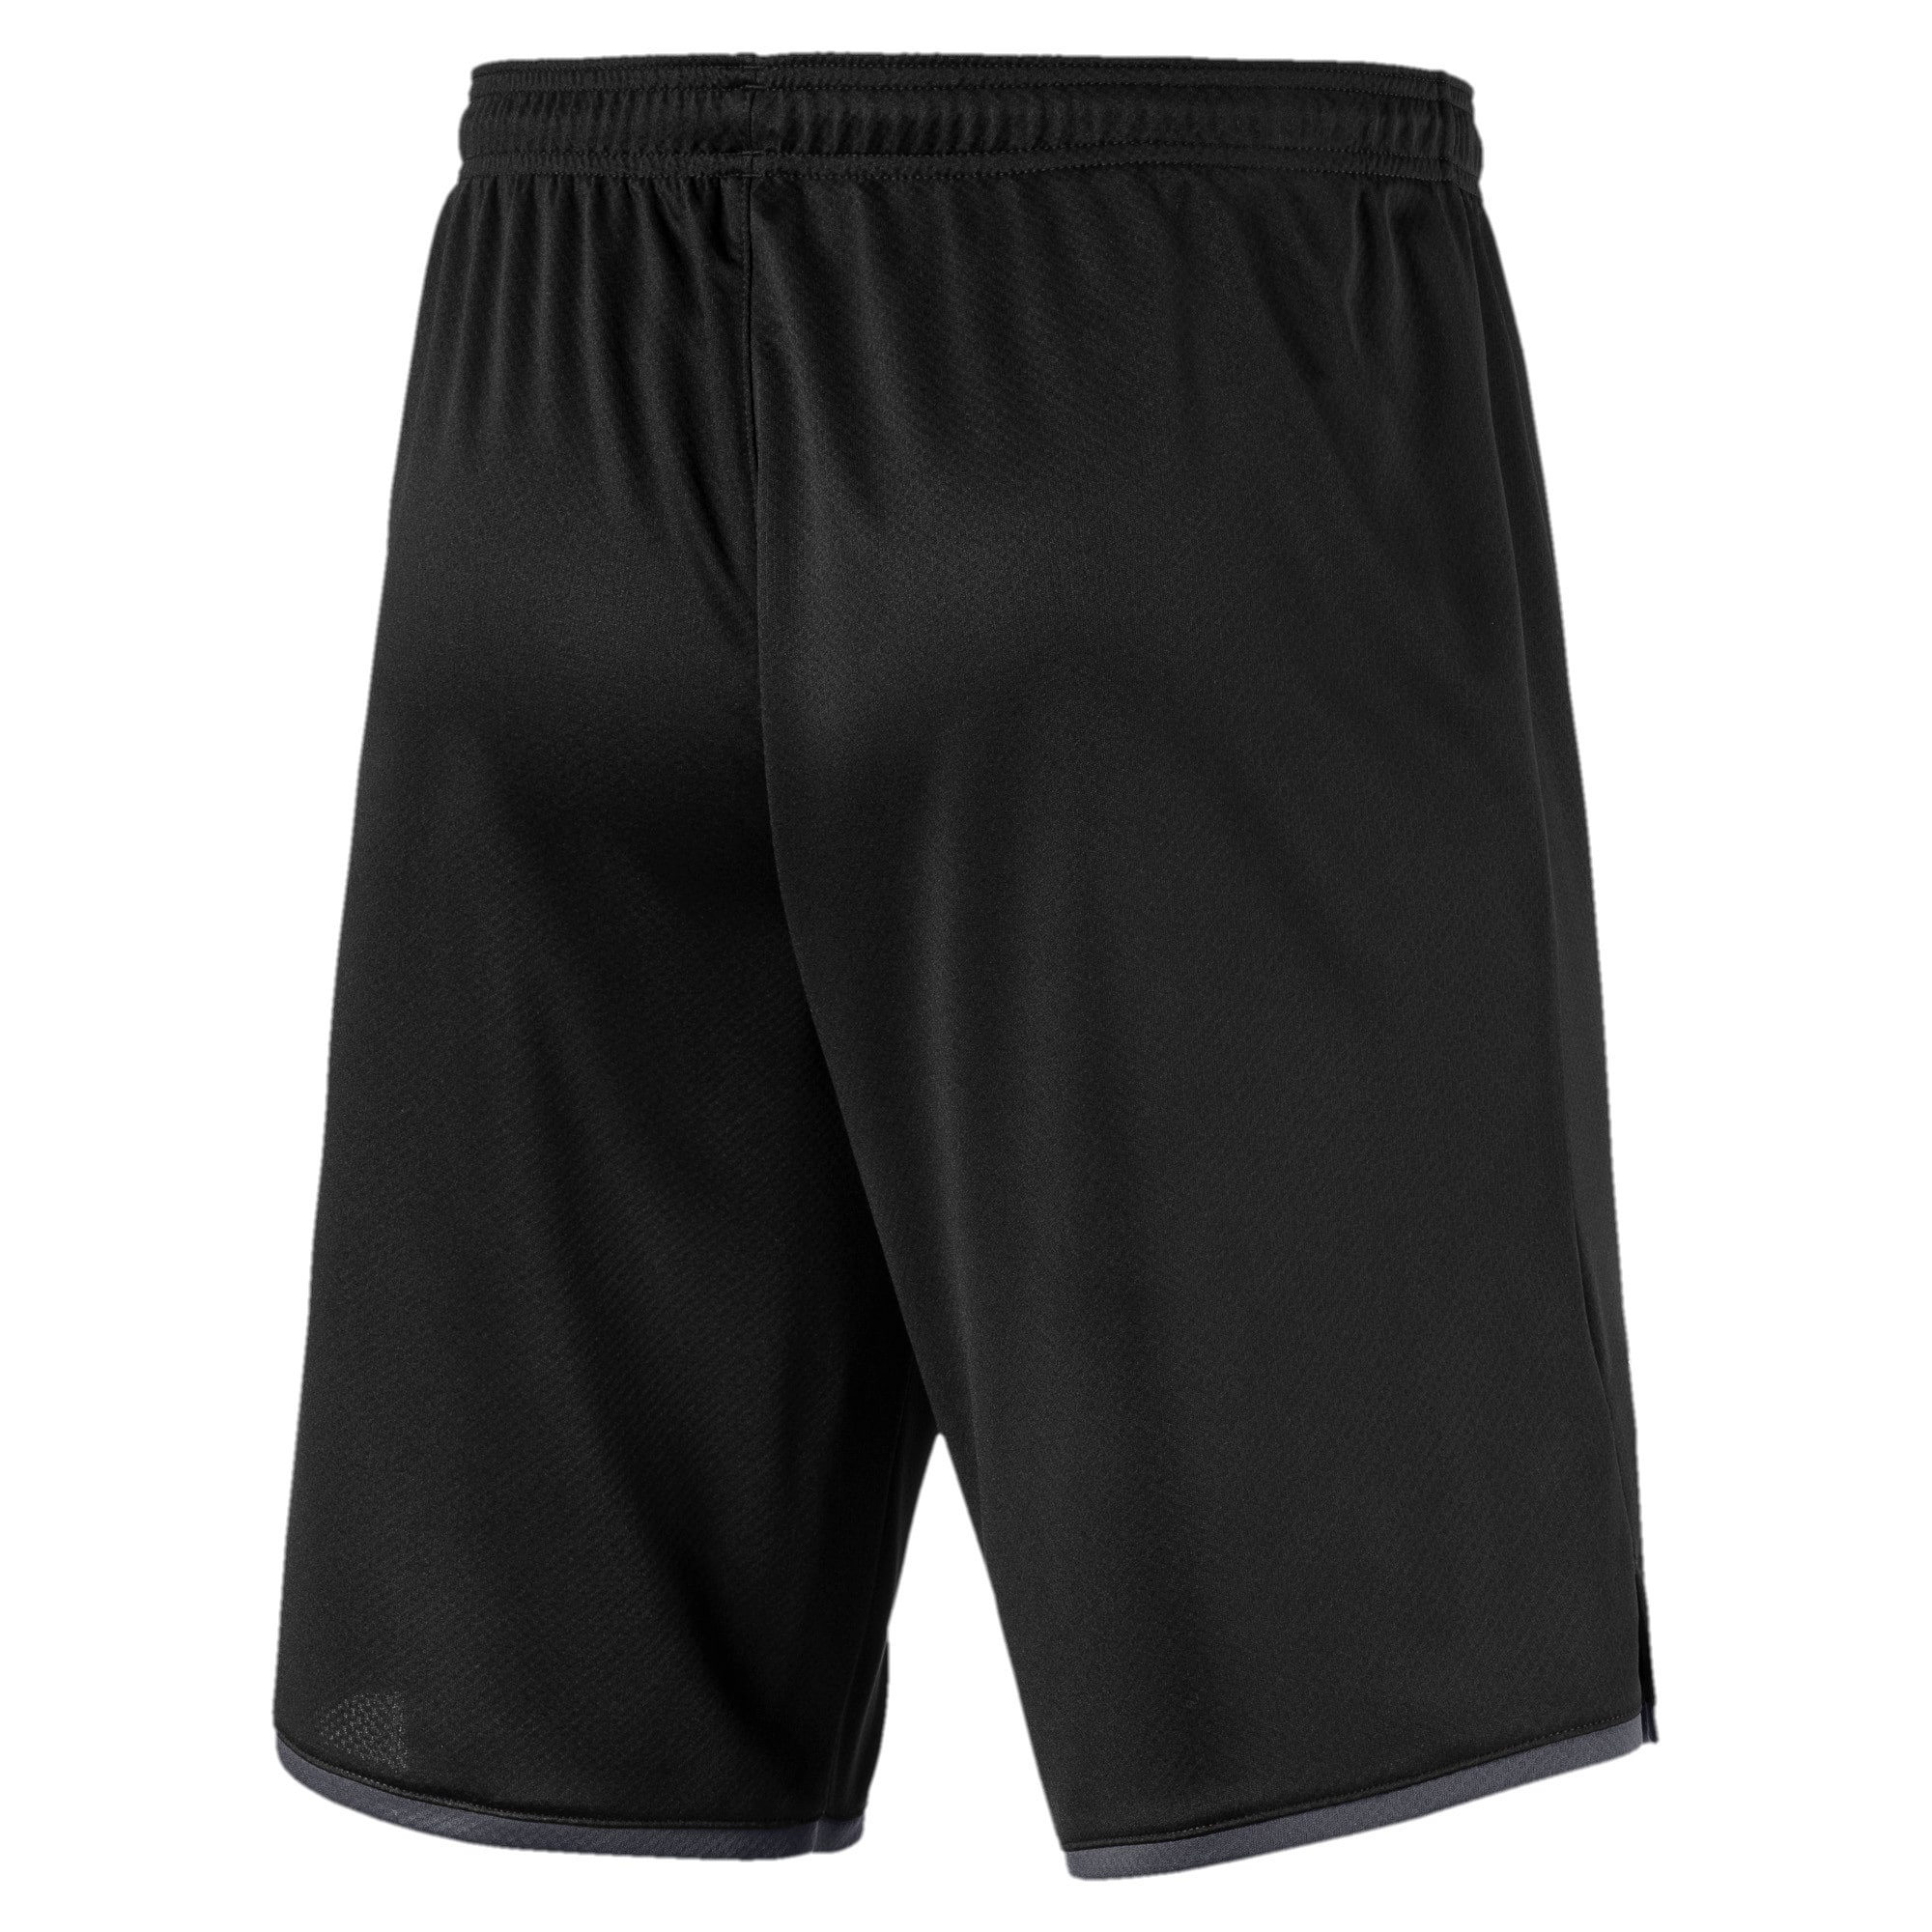 Thumbnail 2 of BVB Men's Away Replica Shorts, Puma Black-Ebony, medium